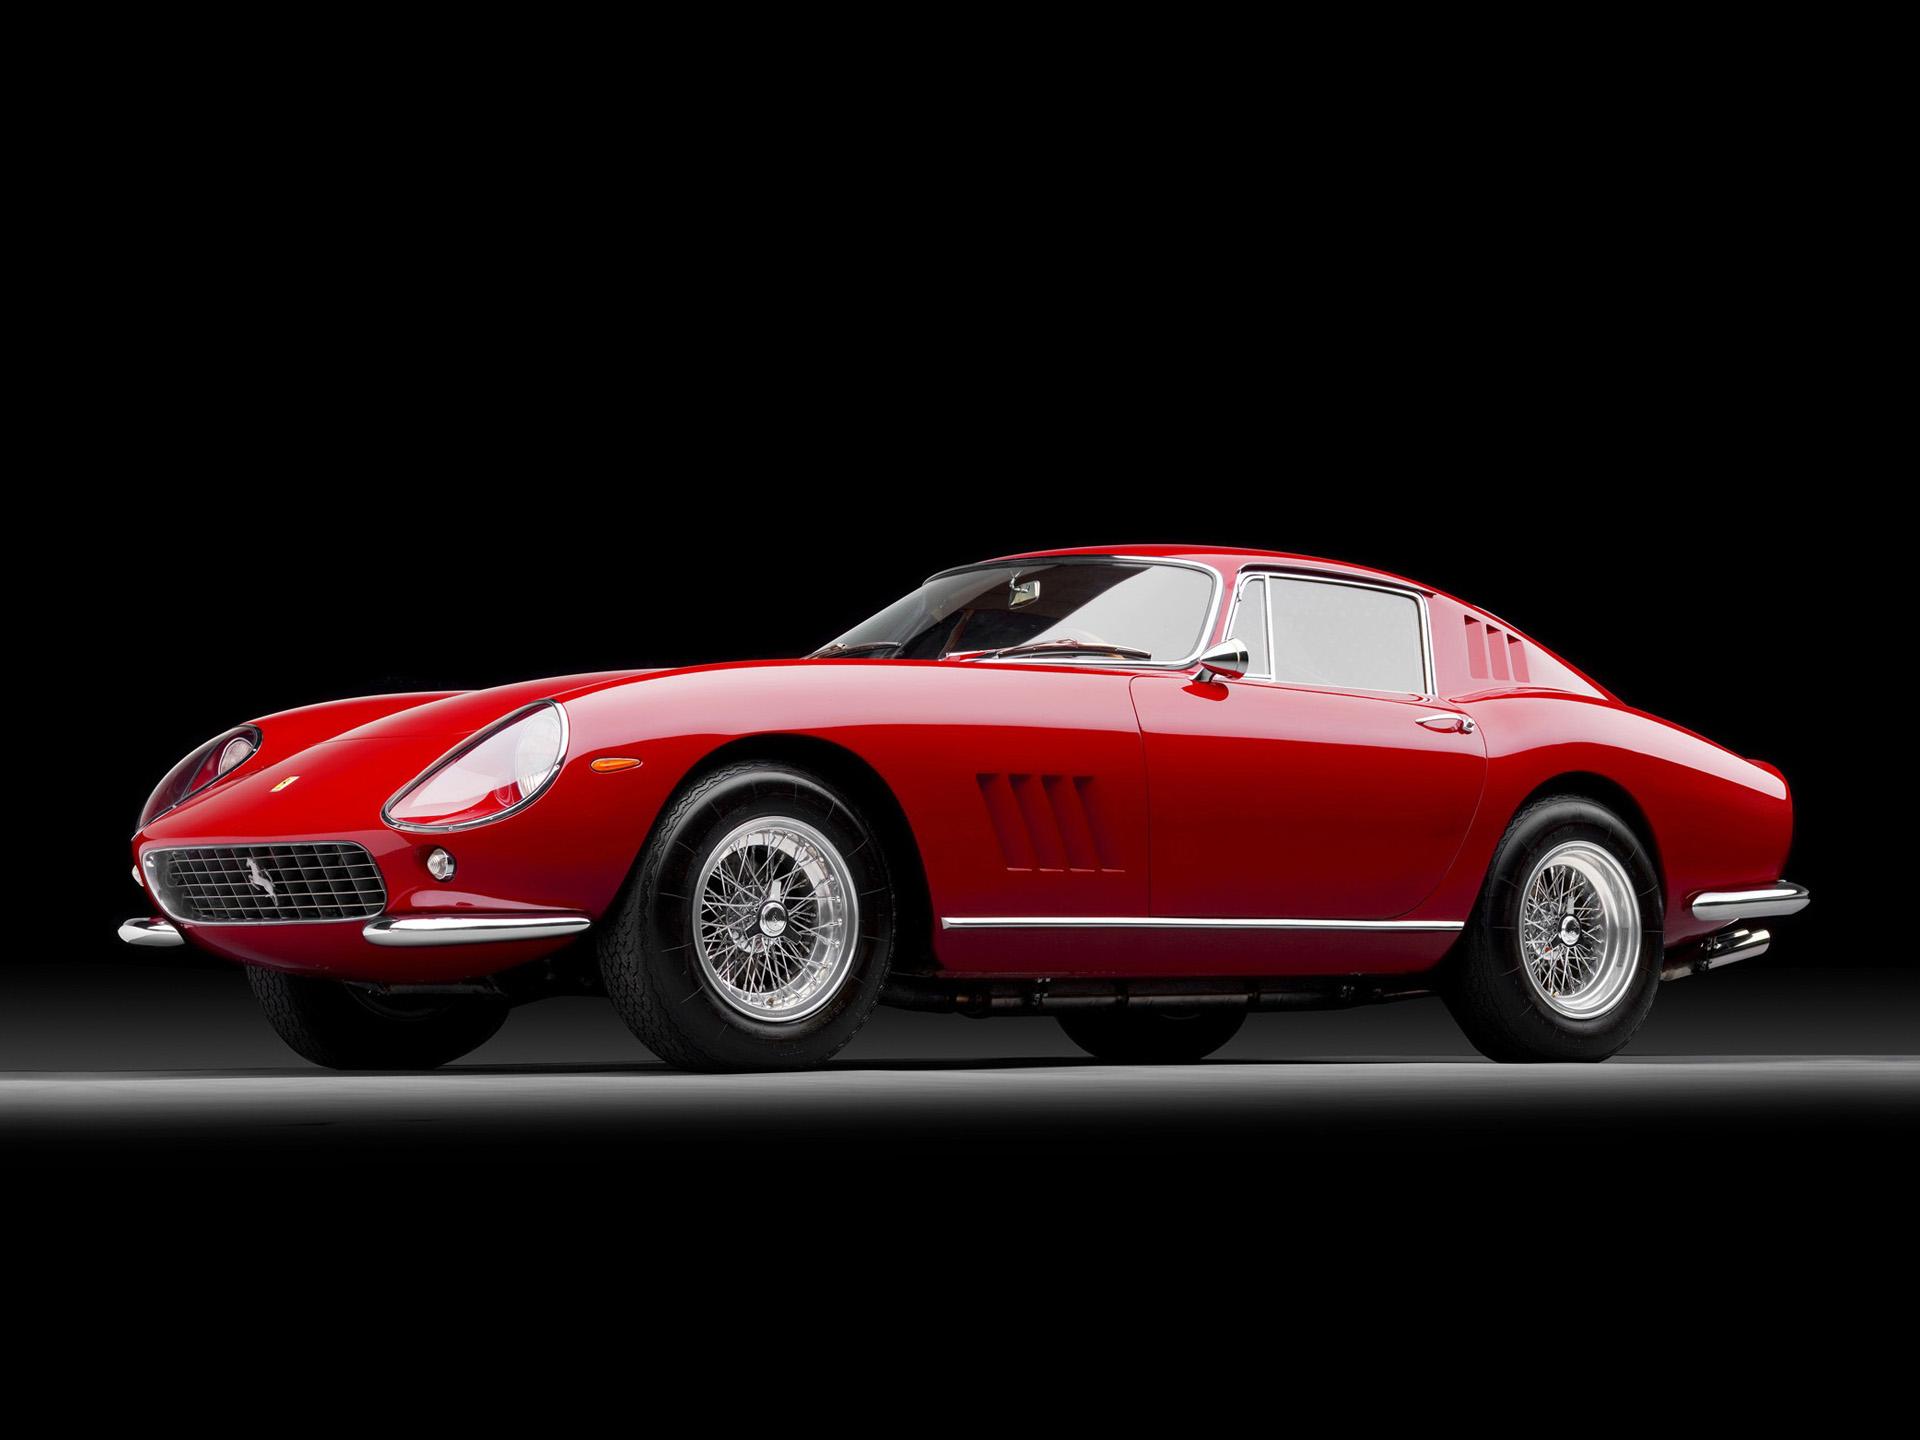 1966 Ferrari 275 Gtb 4 Classic Supercar H Wallpaper 1920x1440 136647 Wallpaperup